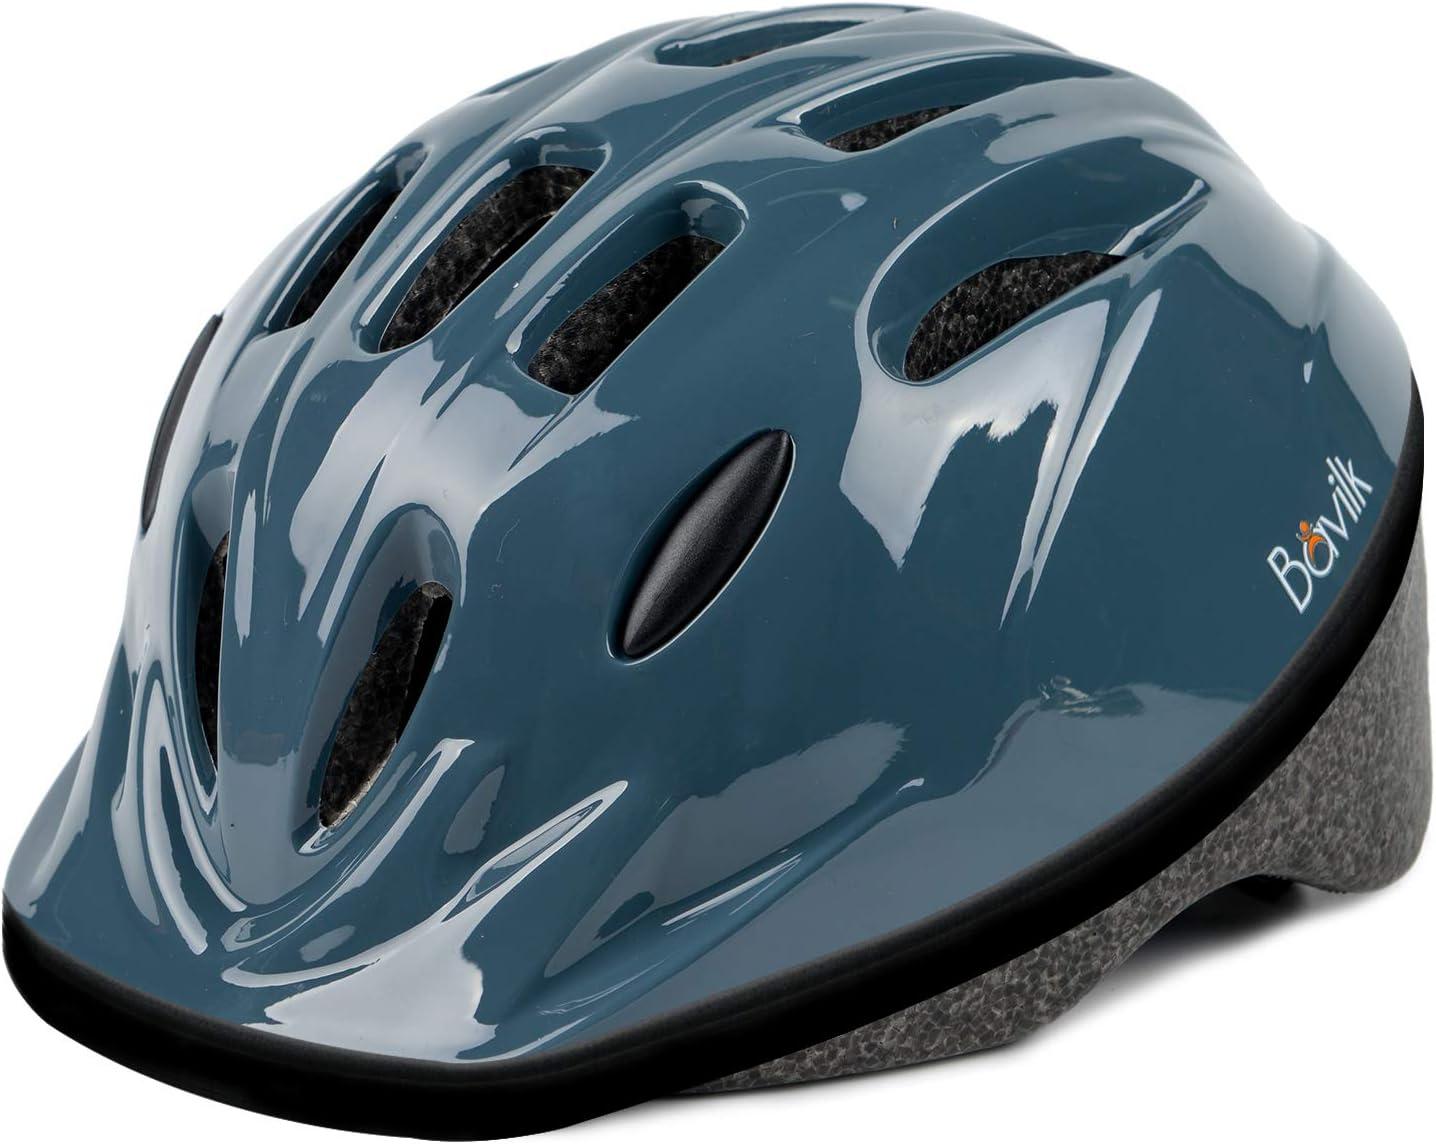 Bavilk Toddler Bike Helmet Kid Helmet CPSC Certified Multisport Adjustable Bicycle Helmet Girls Boys